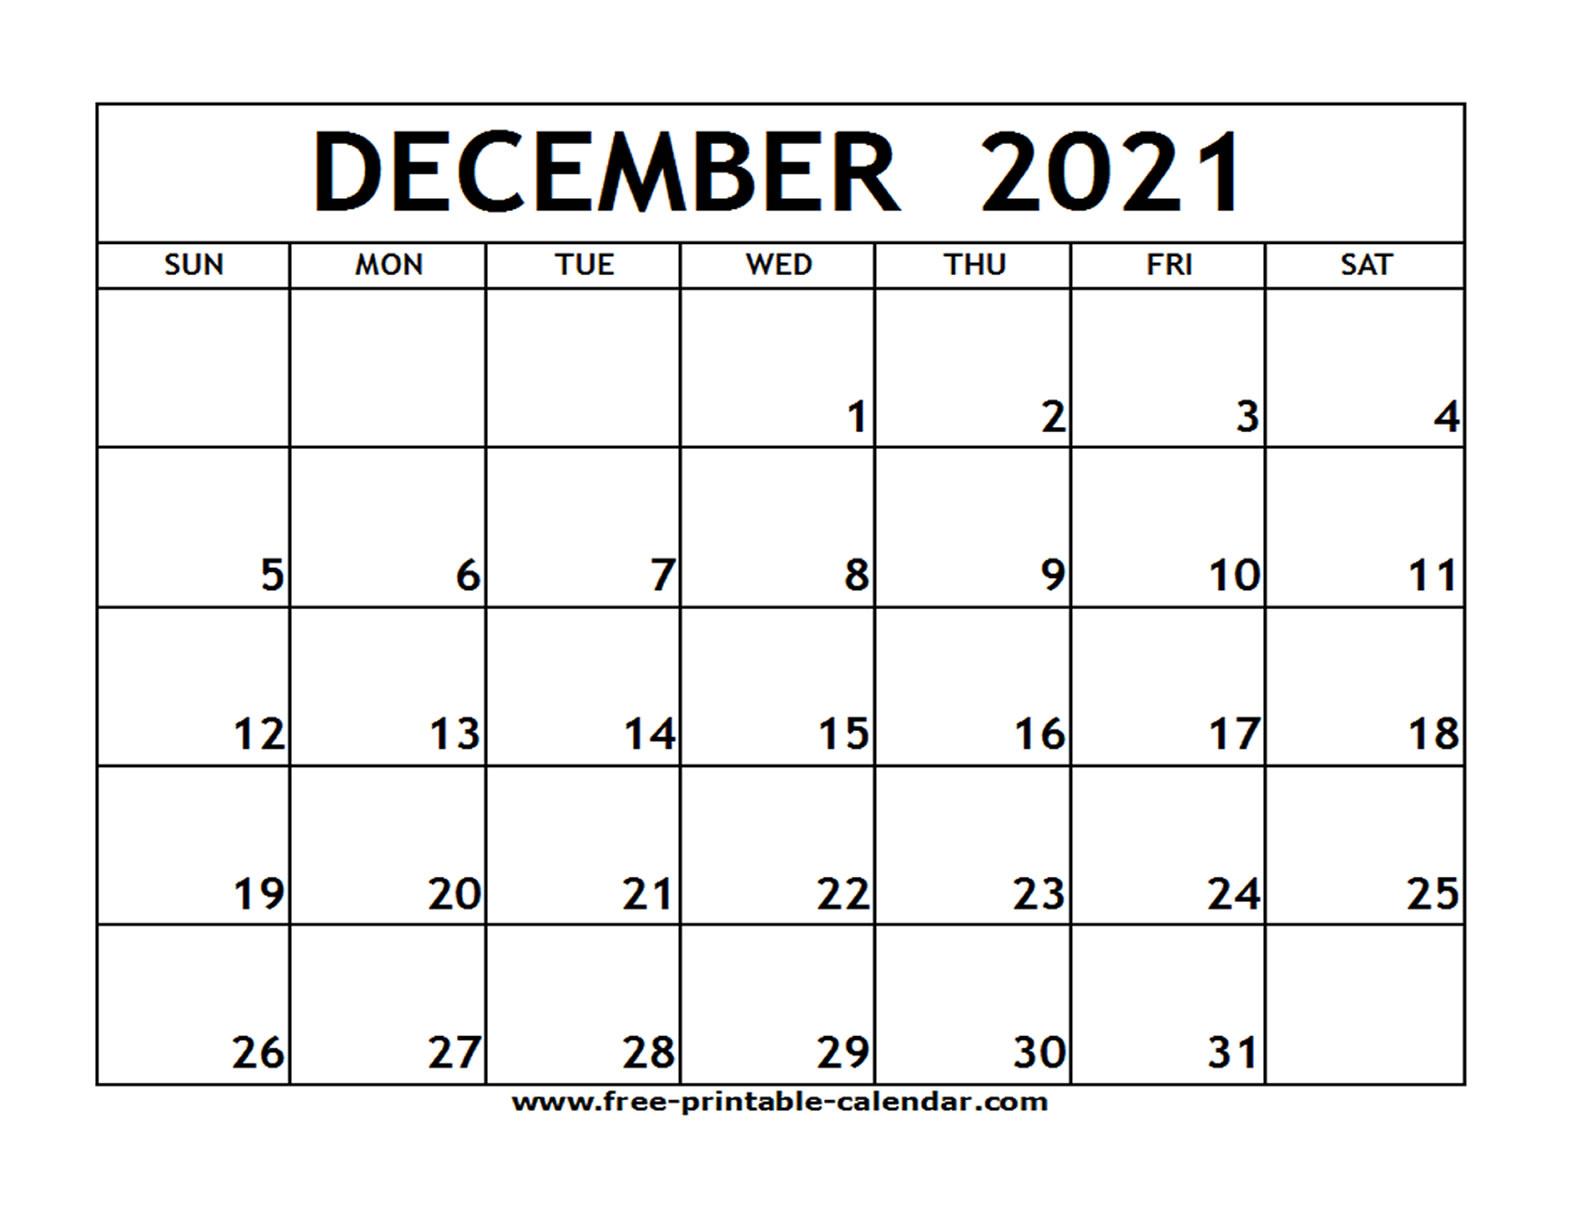 Dec 2021 Printable Calendar   Free Printable Calendar